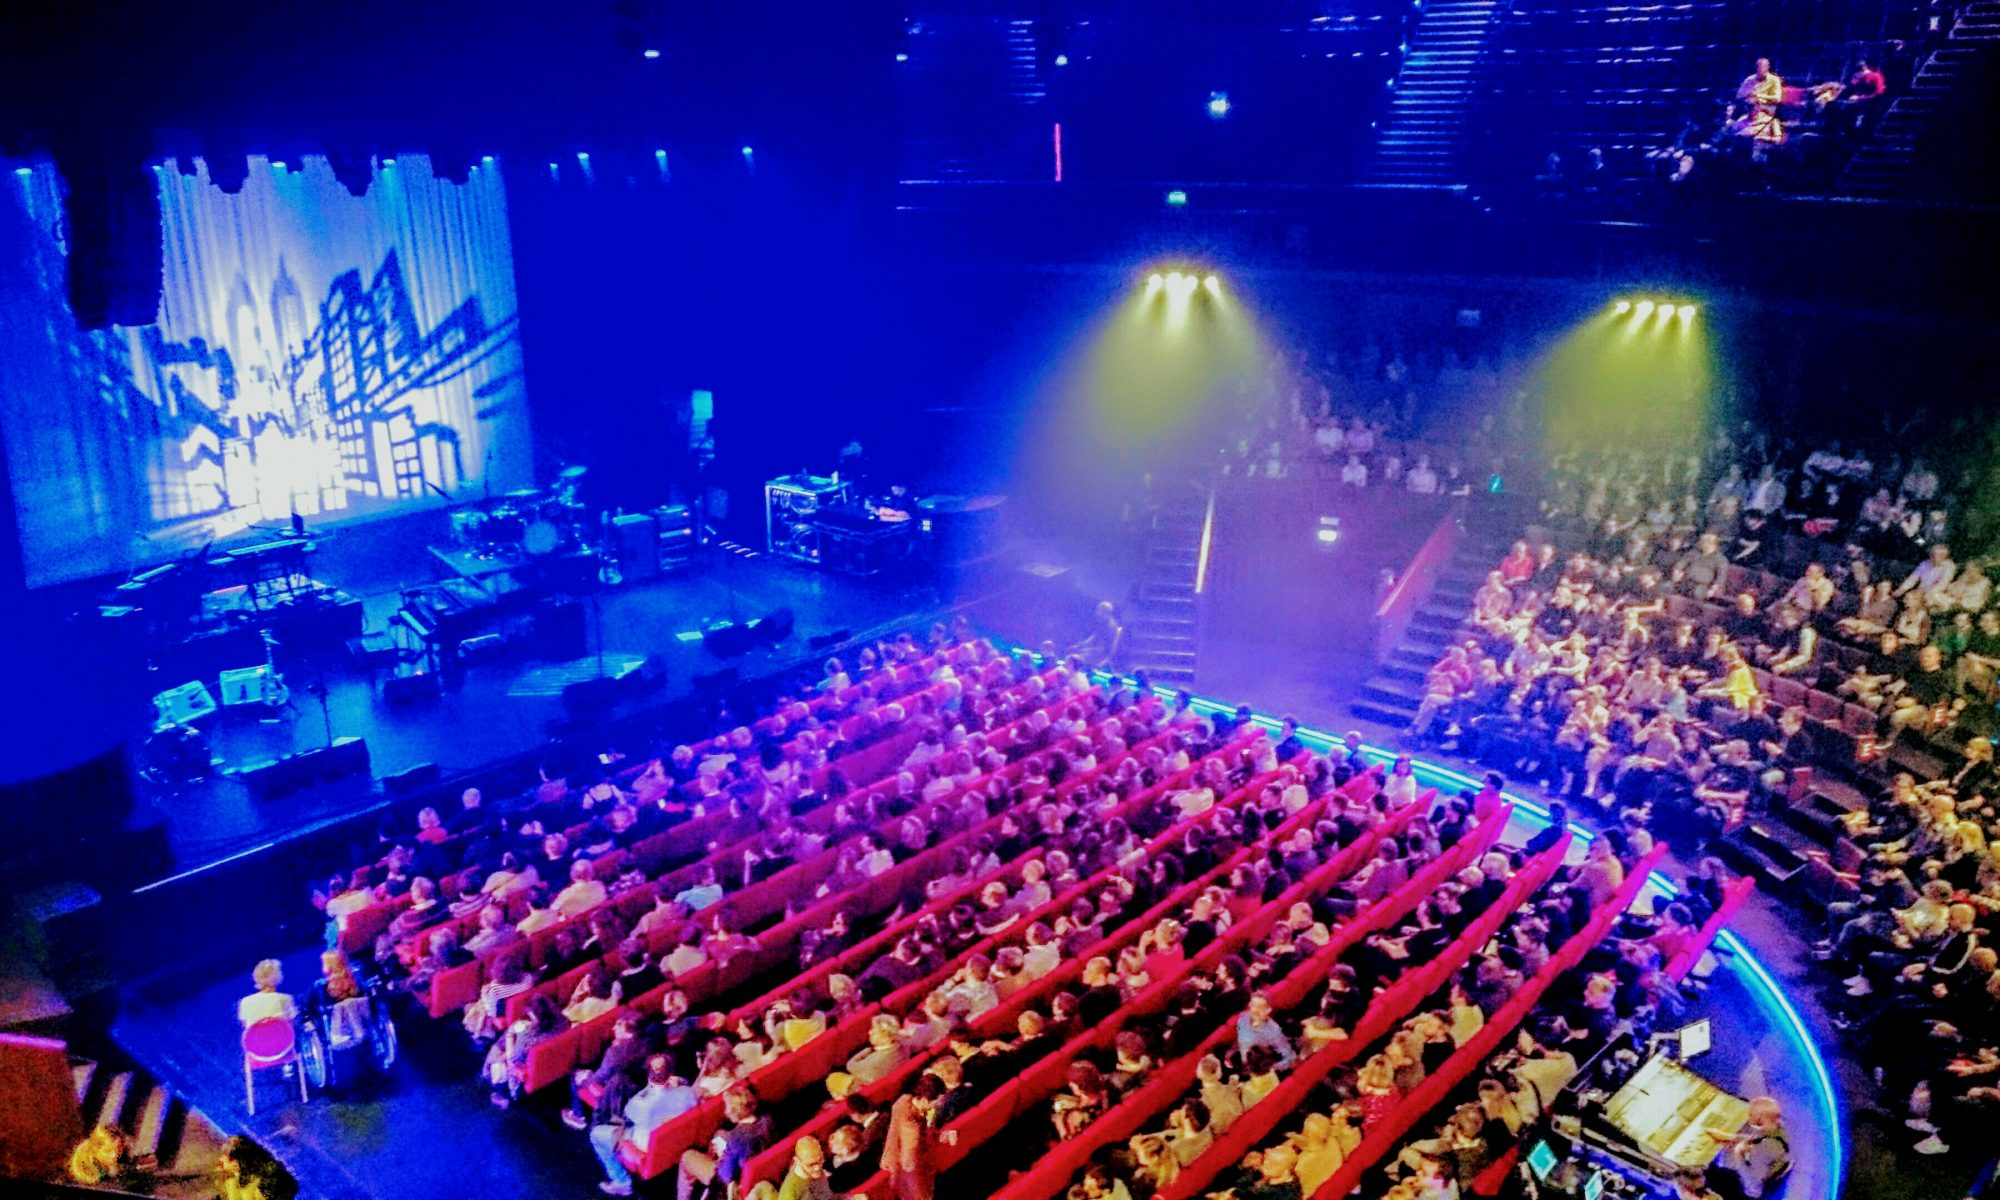 Cirque Royal, Koninklijk Circus, Brussels, Brüssel, Bruxelles, concerthall, concert, Rufus Wainwright, Rachel Eckroth, circus, theatre